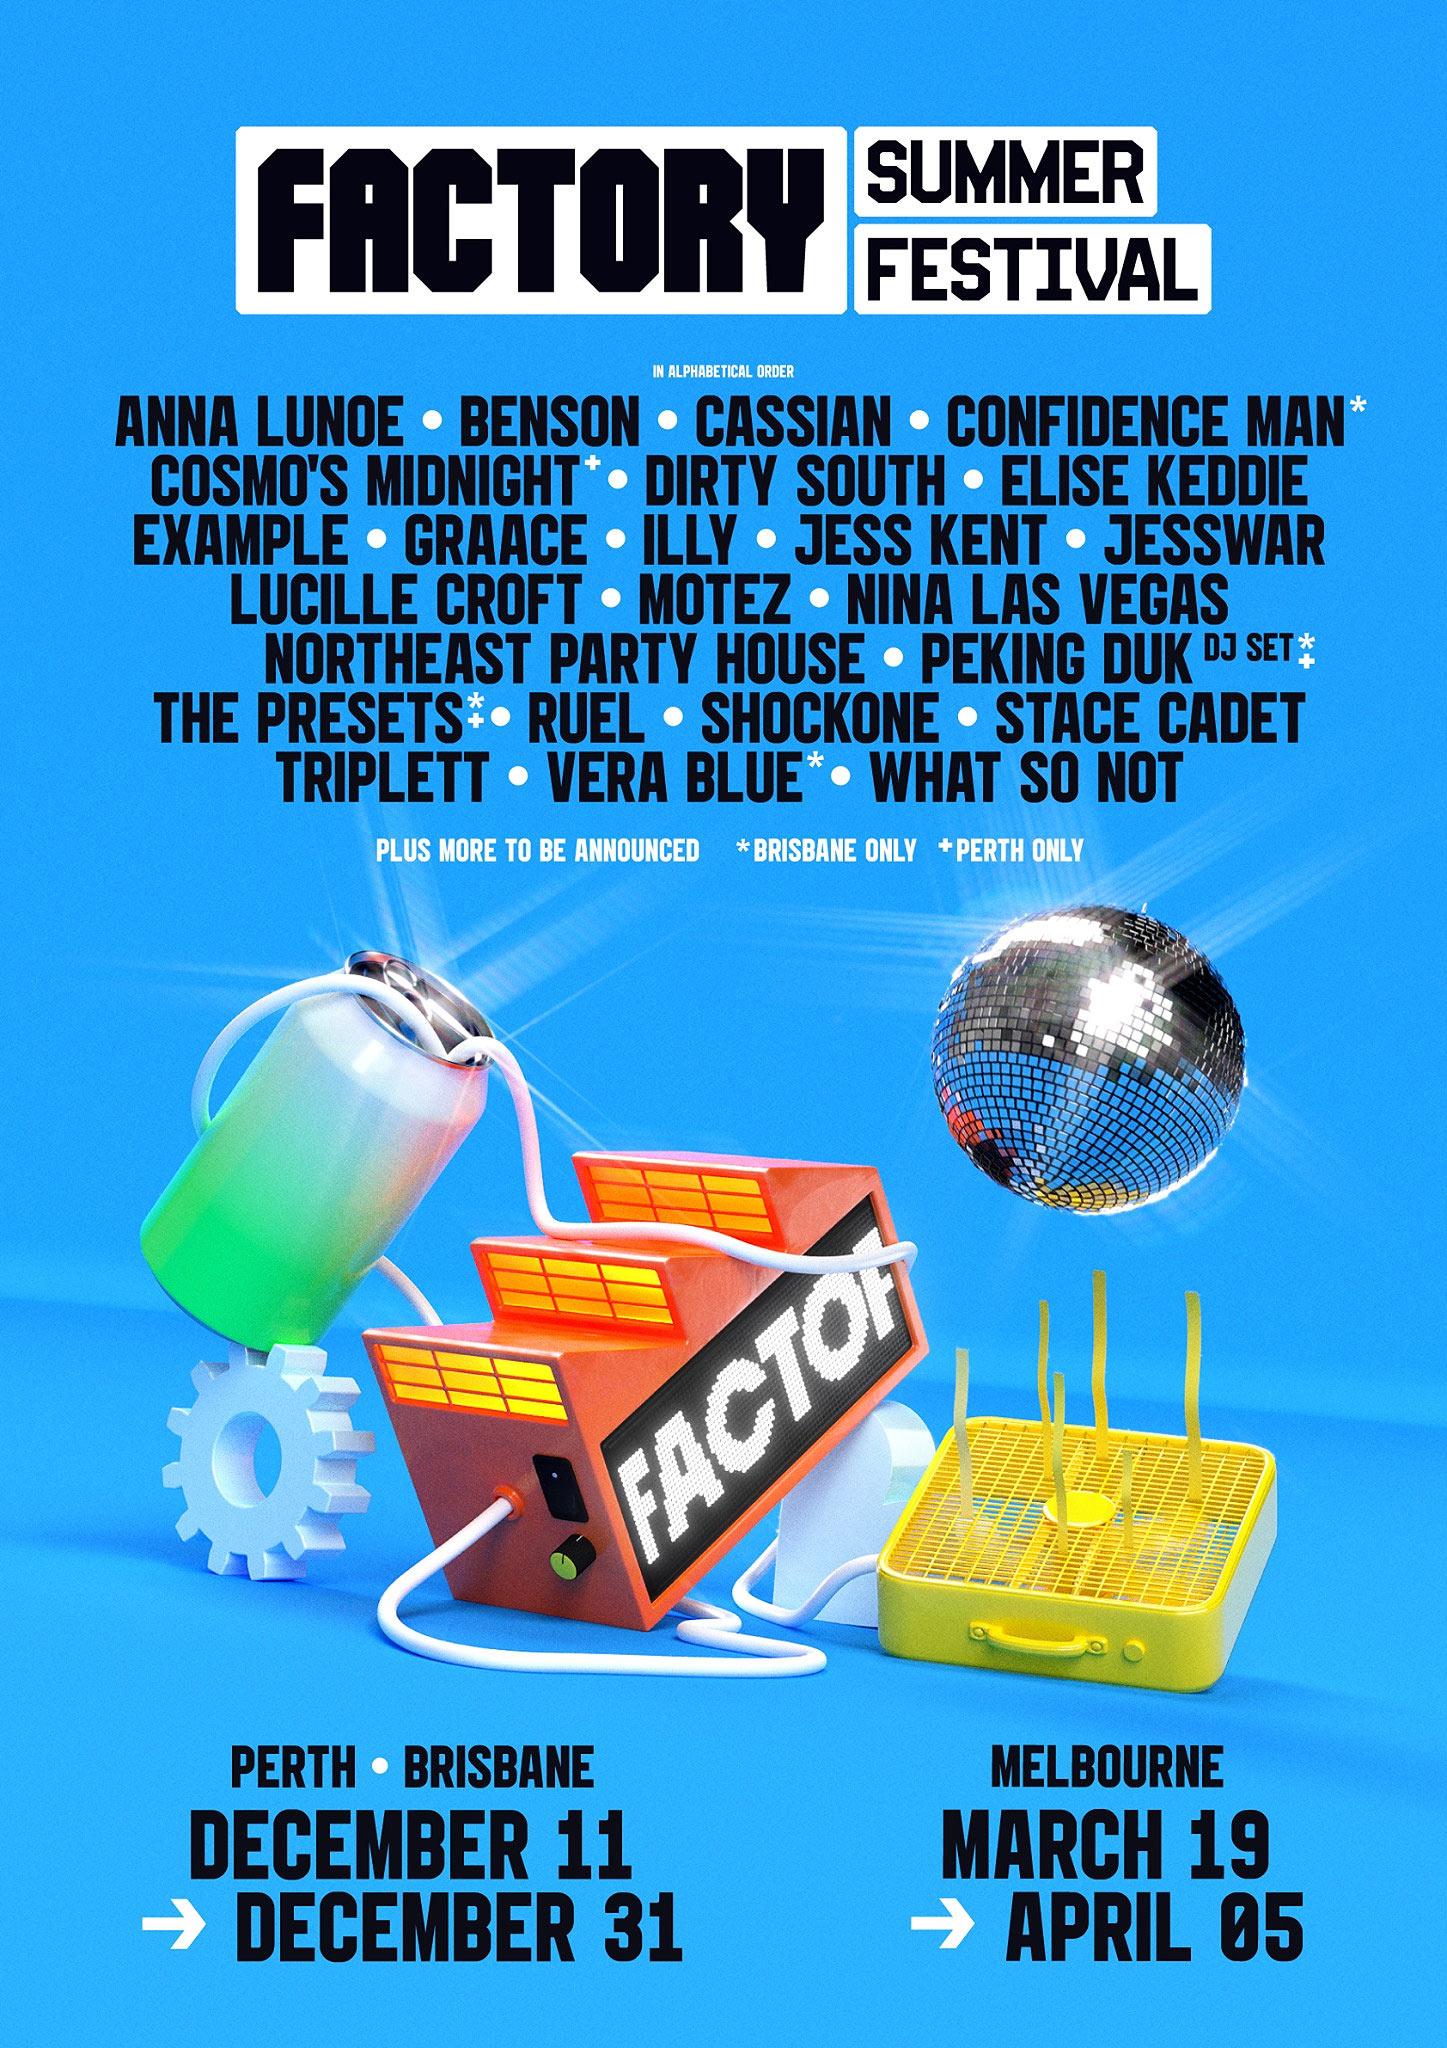 Factory-Summer-Festival-2020-OZ-EDM-Poster